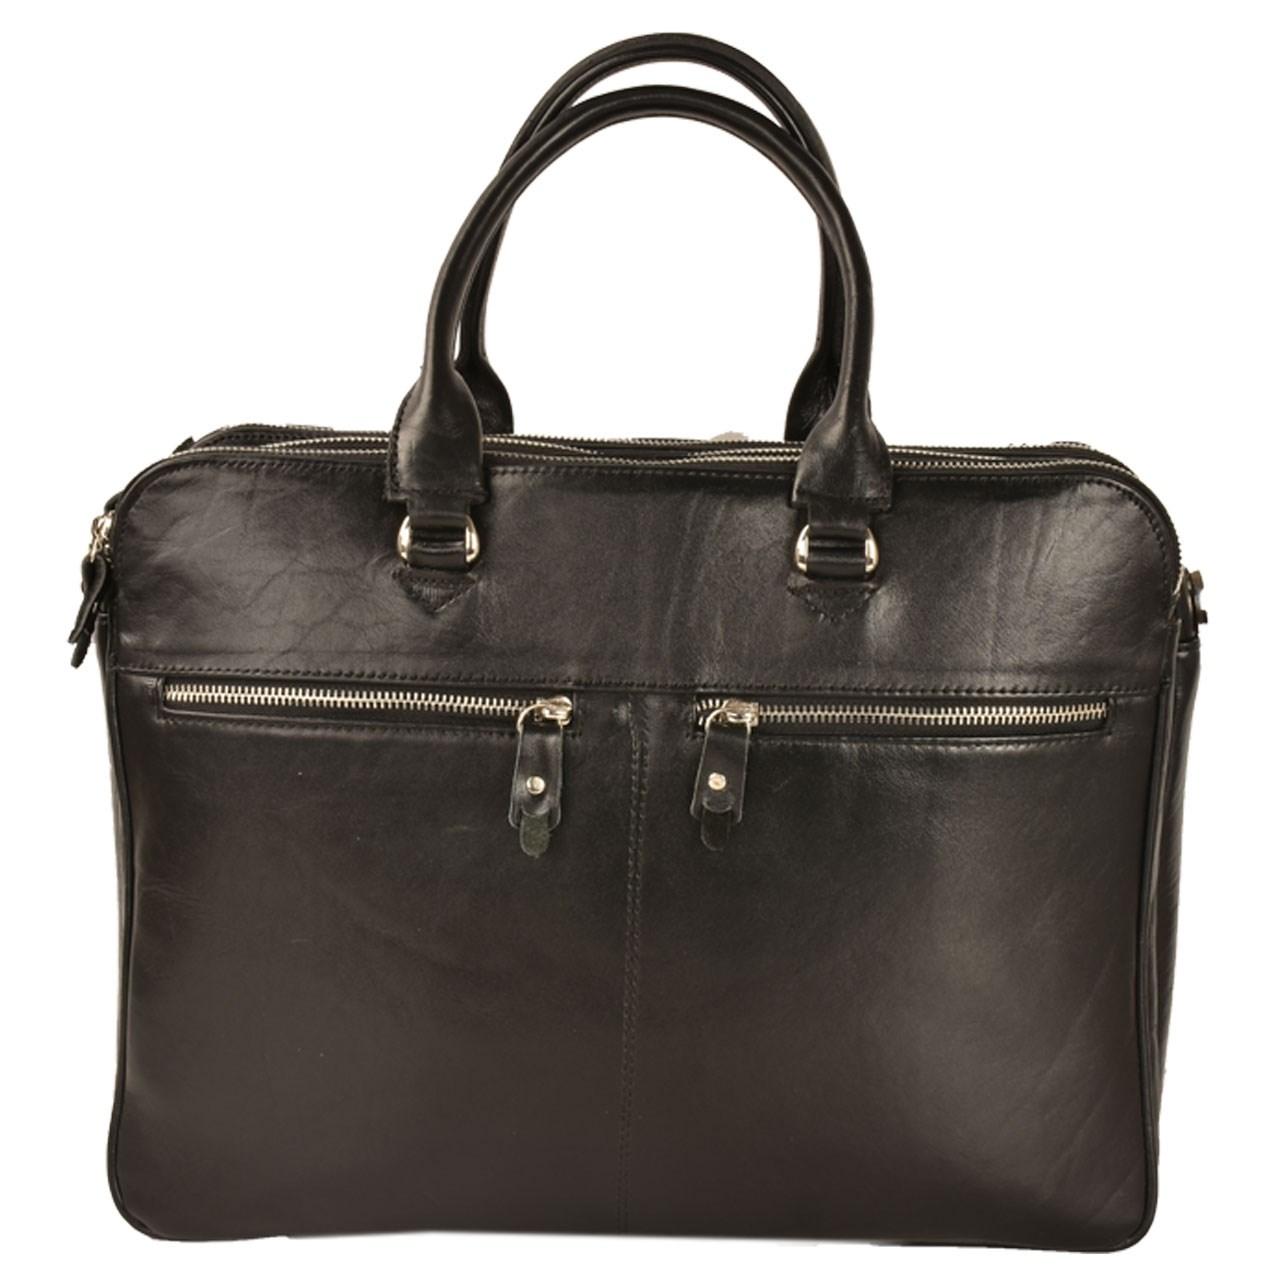 کیف اداری چرم طبیعی کهن چرم مدل L90